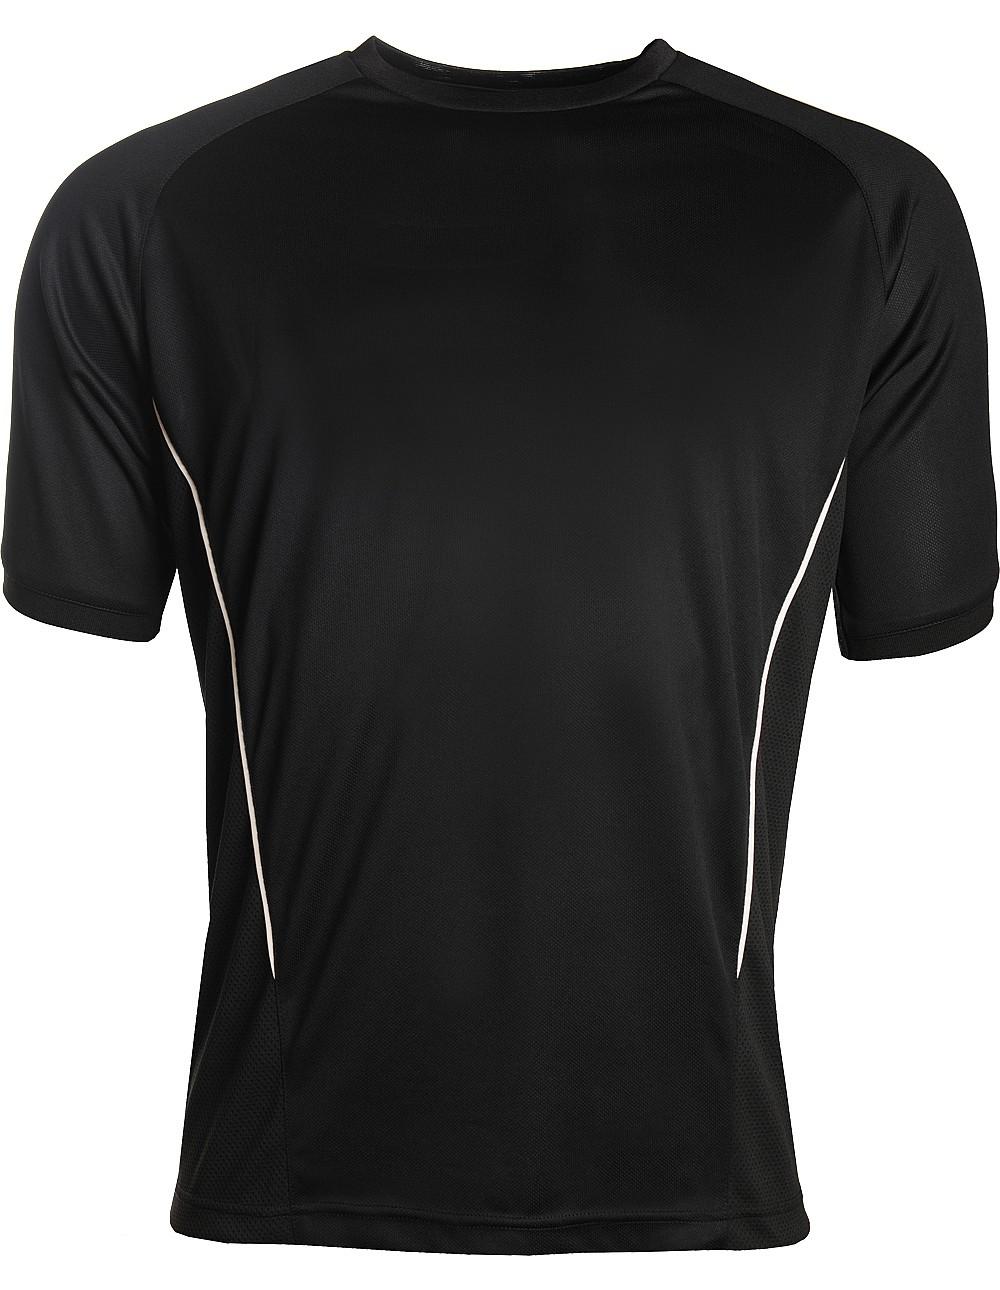 black/white training top by Aptus sports